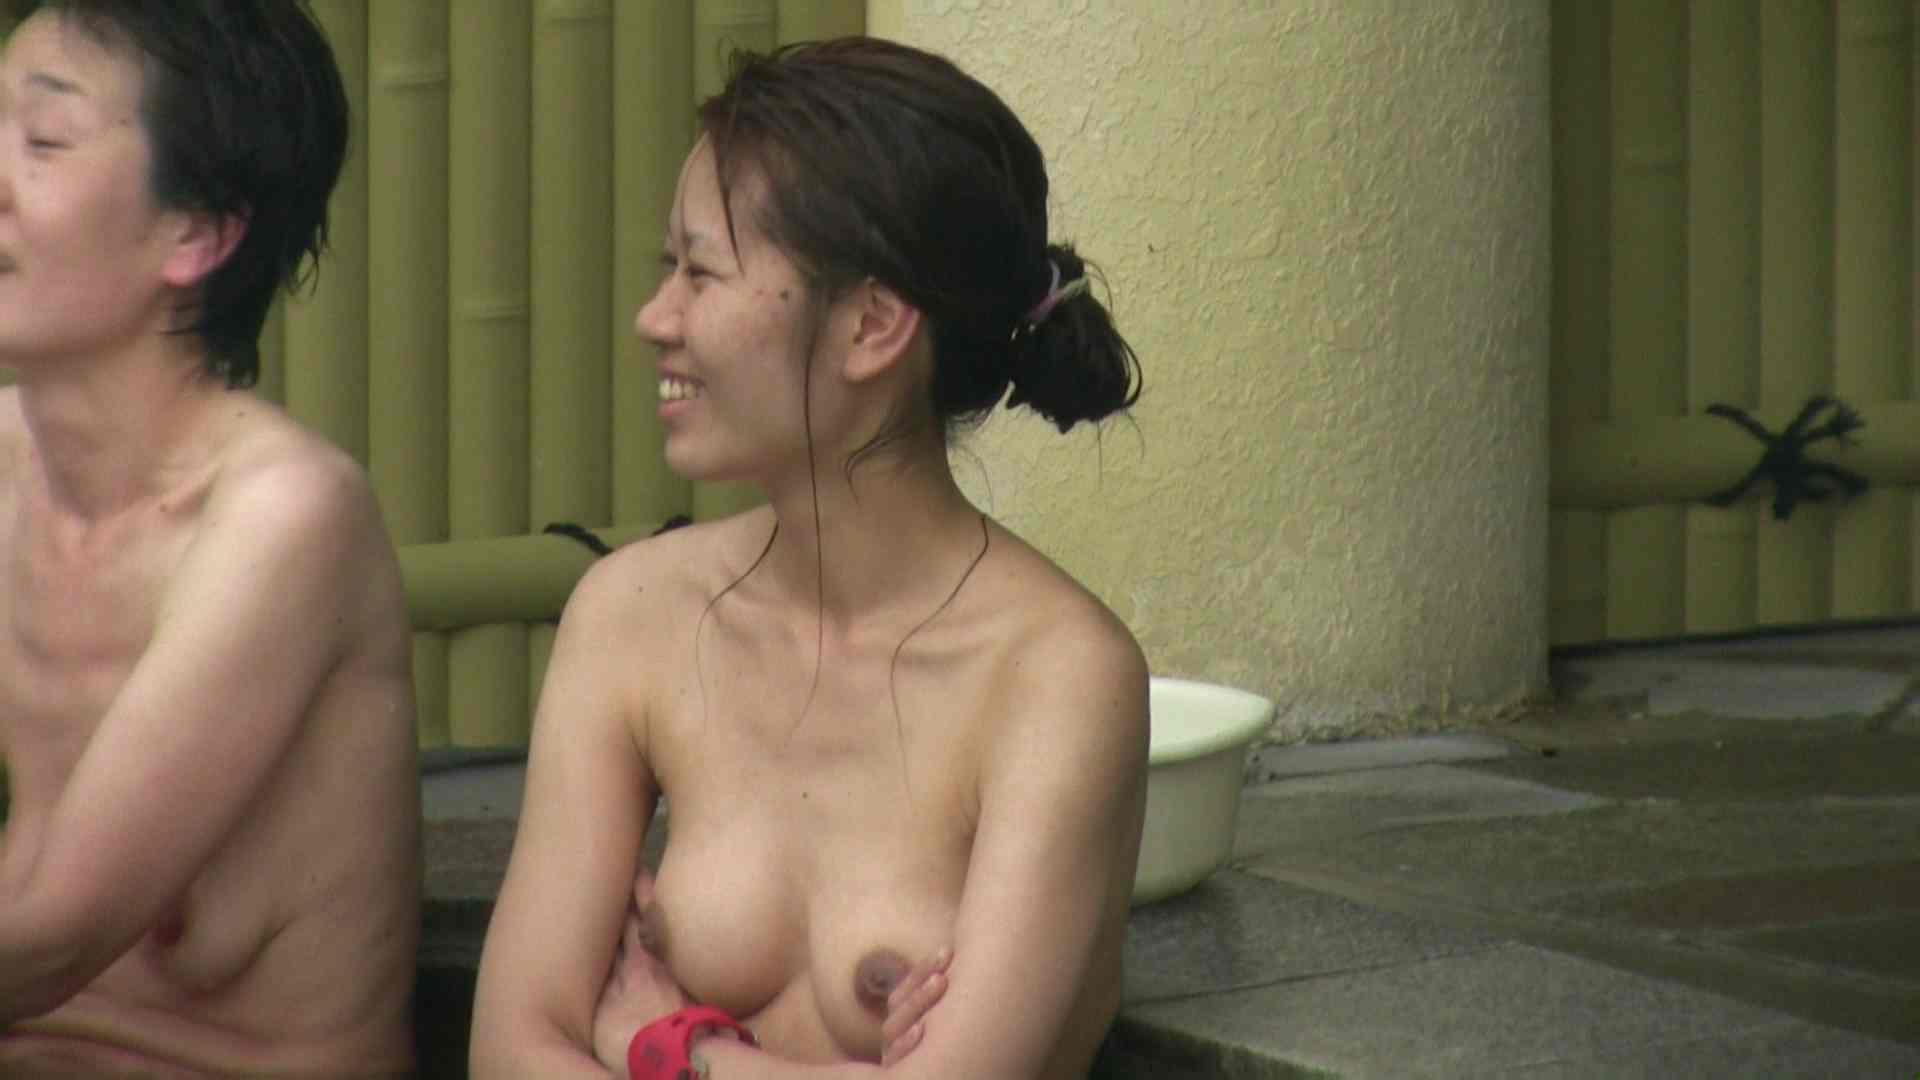 Aquaな露天風呂Vol.07 露天風呂 エロ無料画像 111連発 80